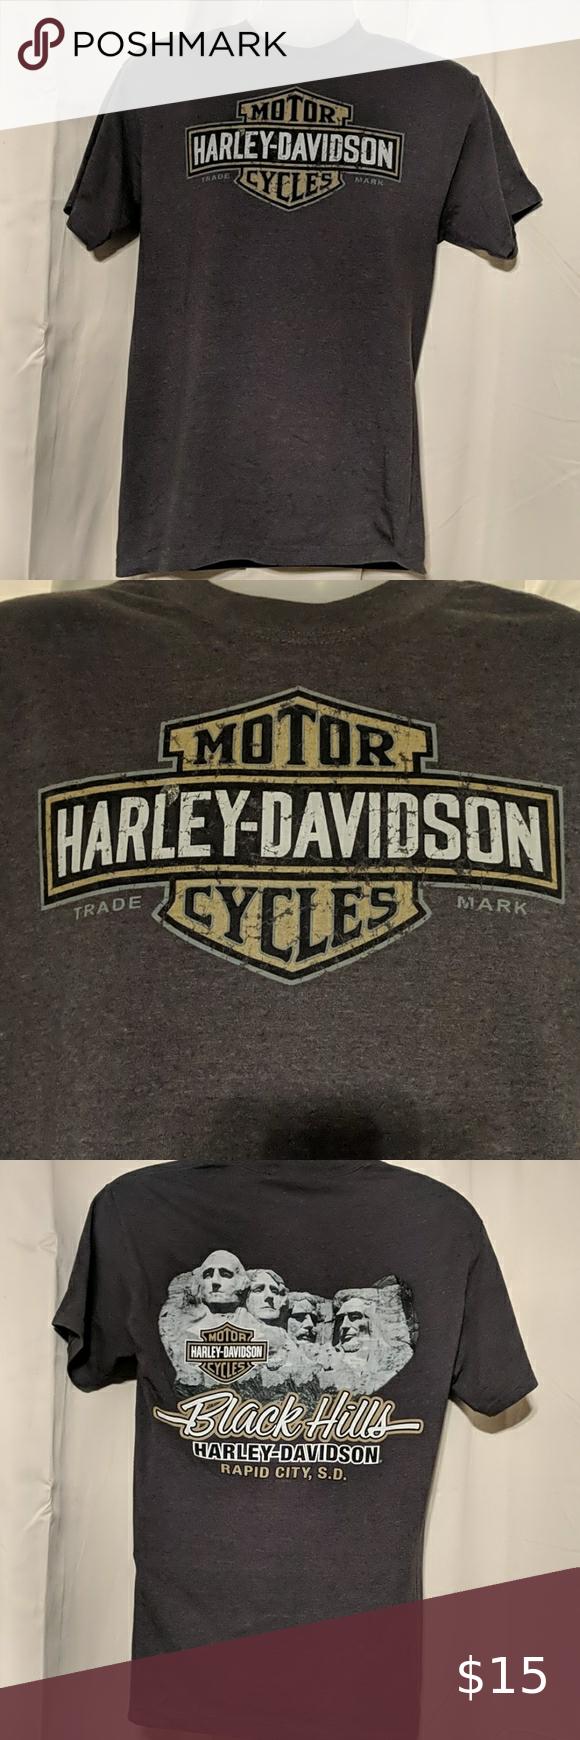 Harley Davidson T Shirt In 2020 Harley Davidson T Shirts Harley Davidson Shirt Harley Davidson [ 1740 x 580 Pixel ]